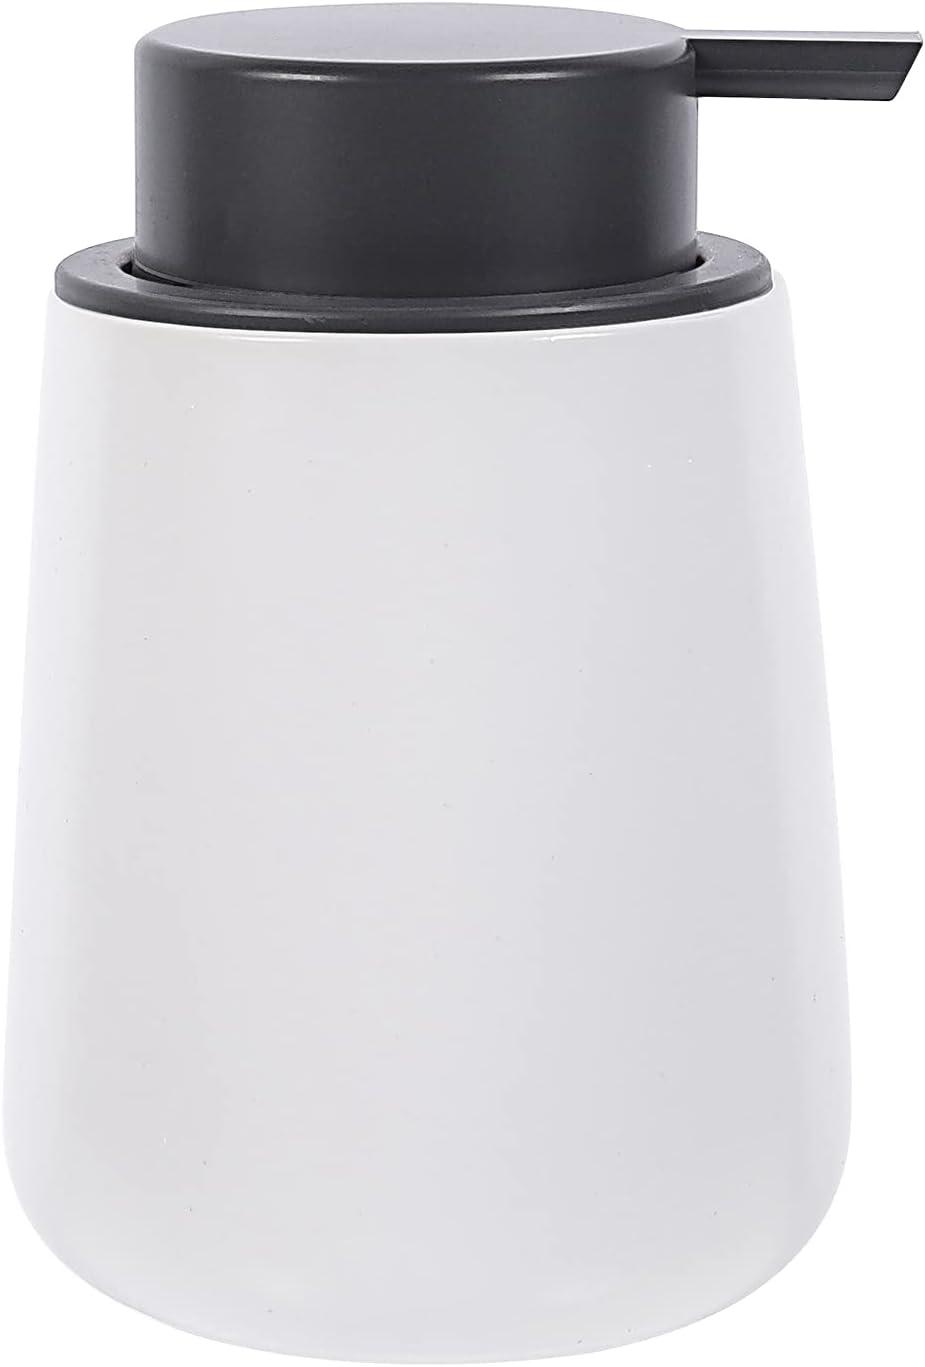 Cabilock Useful 1Pc Price reduction Ceramic Lotion Bot Many popular brands Bottle Shampoo Dispensing